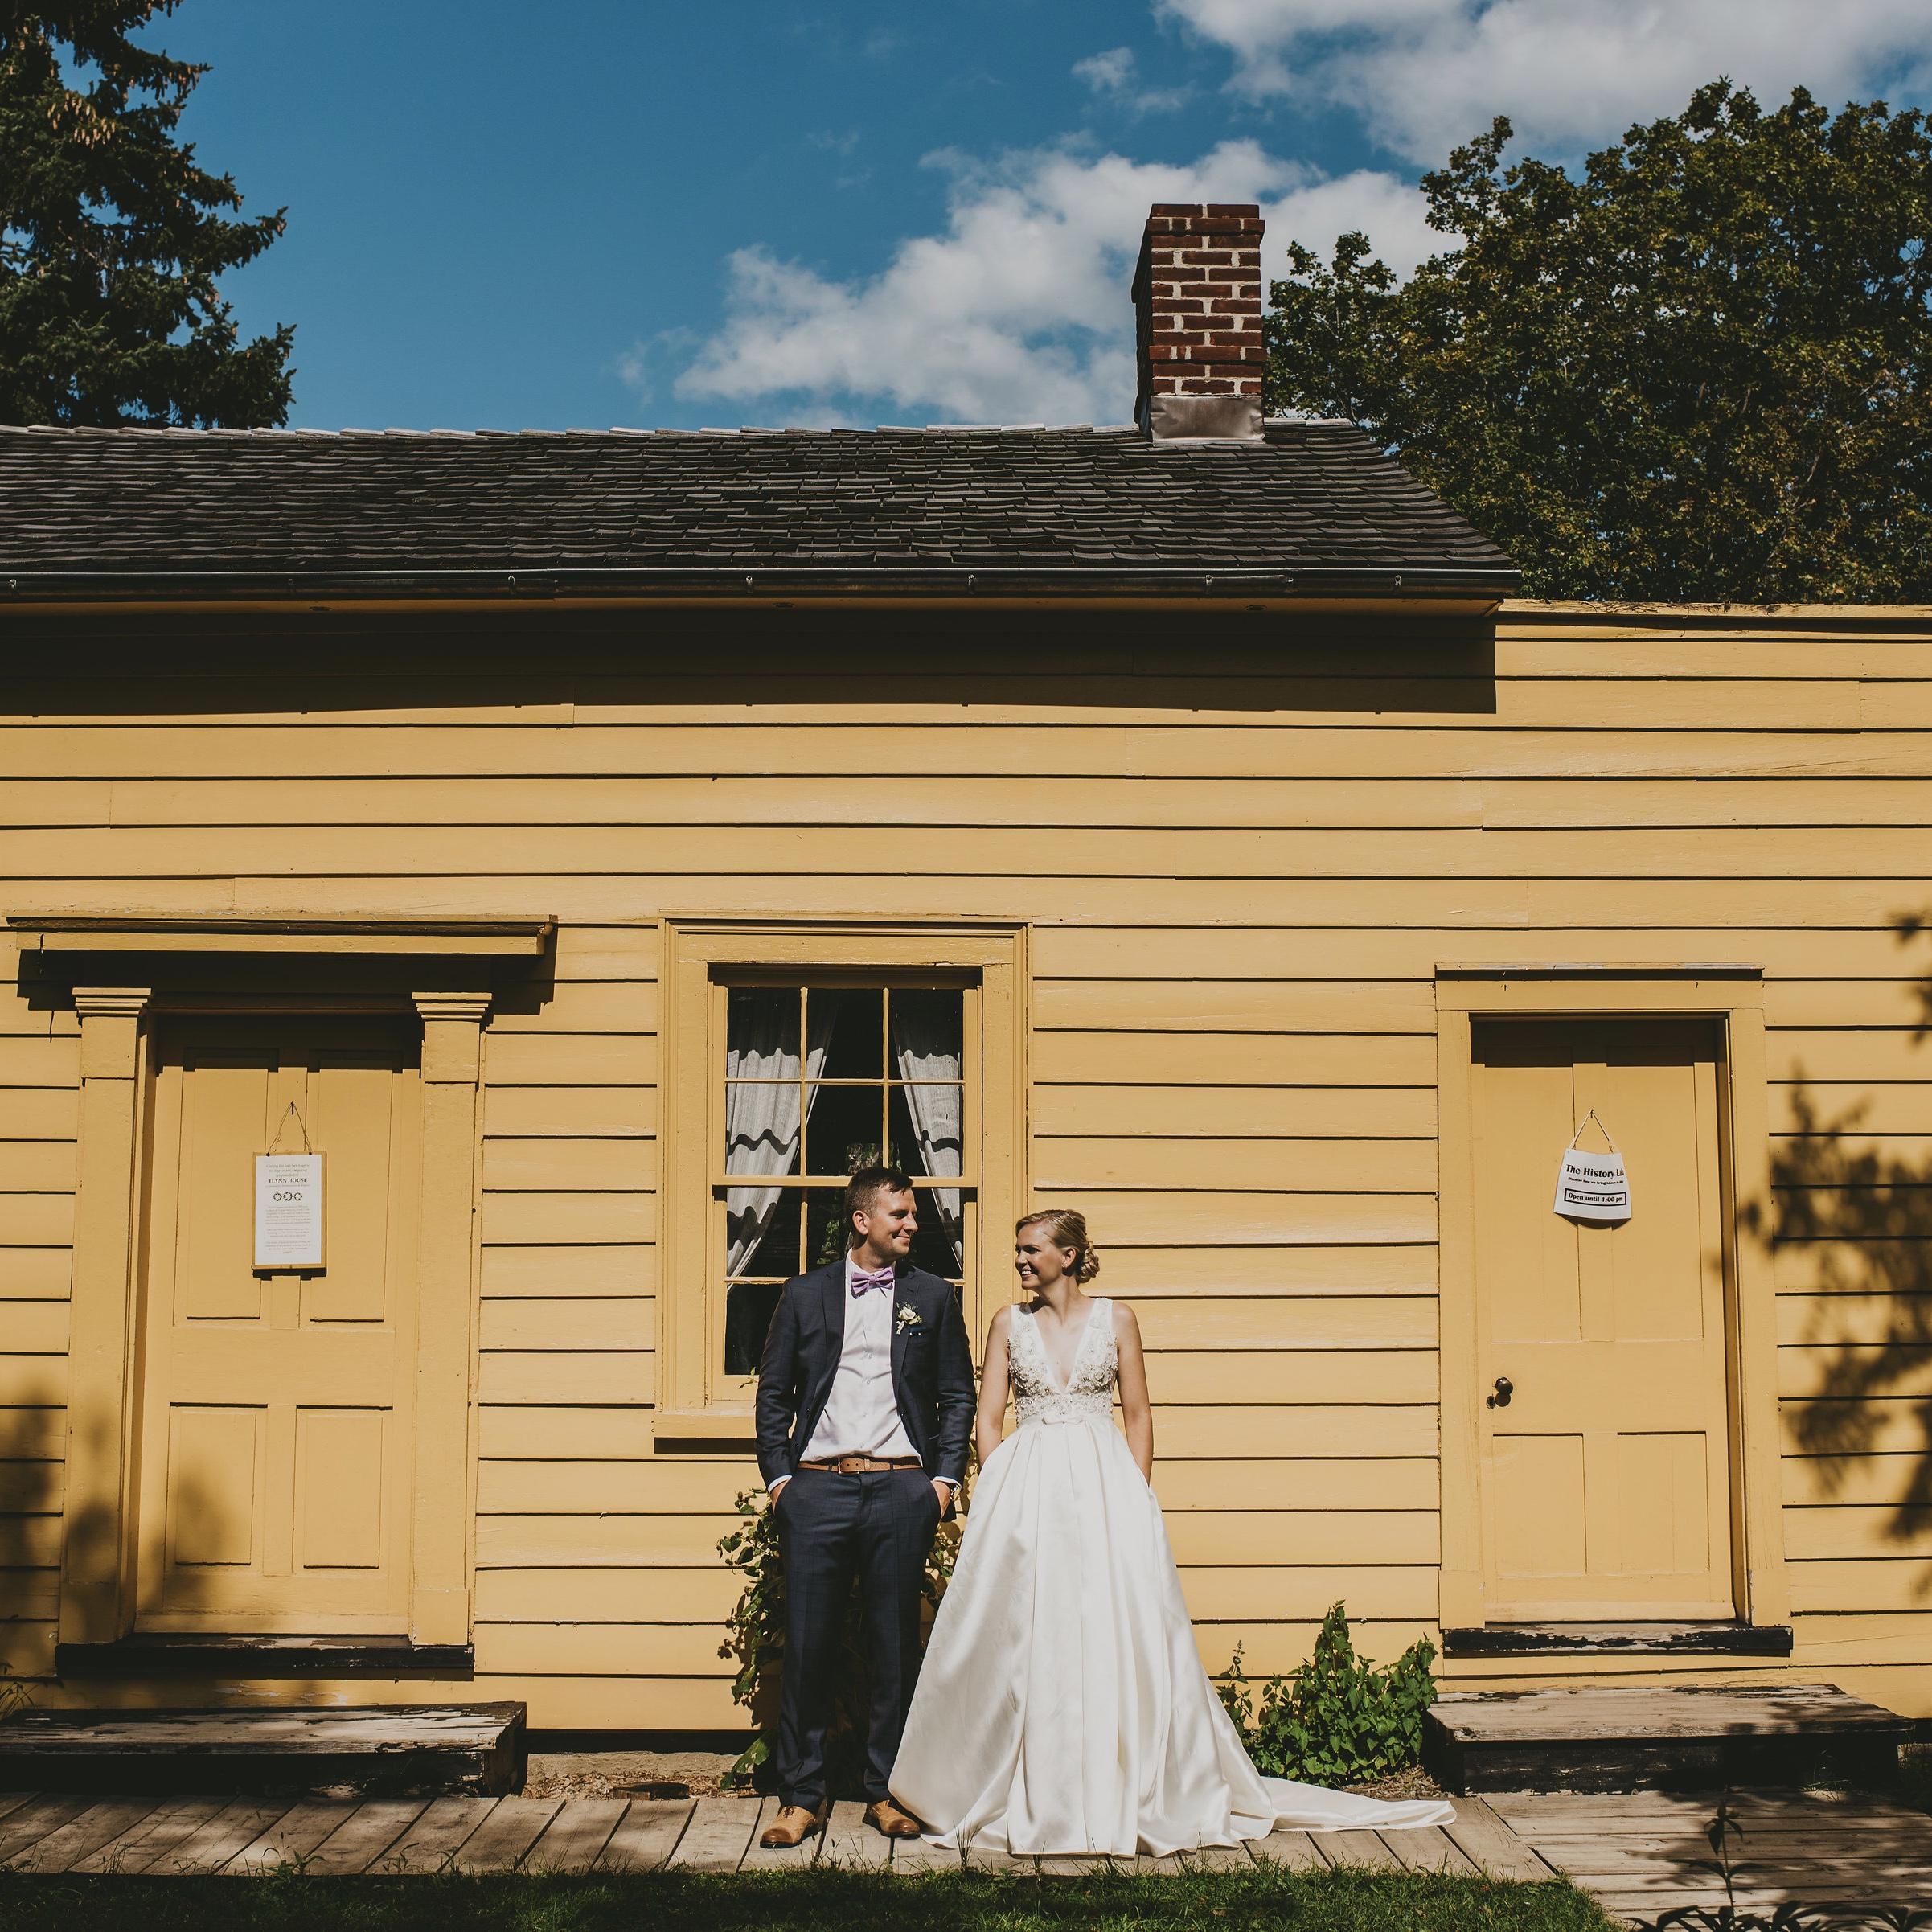 HEATHER & SHANE'S WEDDING - BLACK CREEK PIONEER VILLAGE